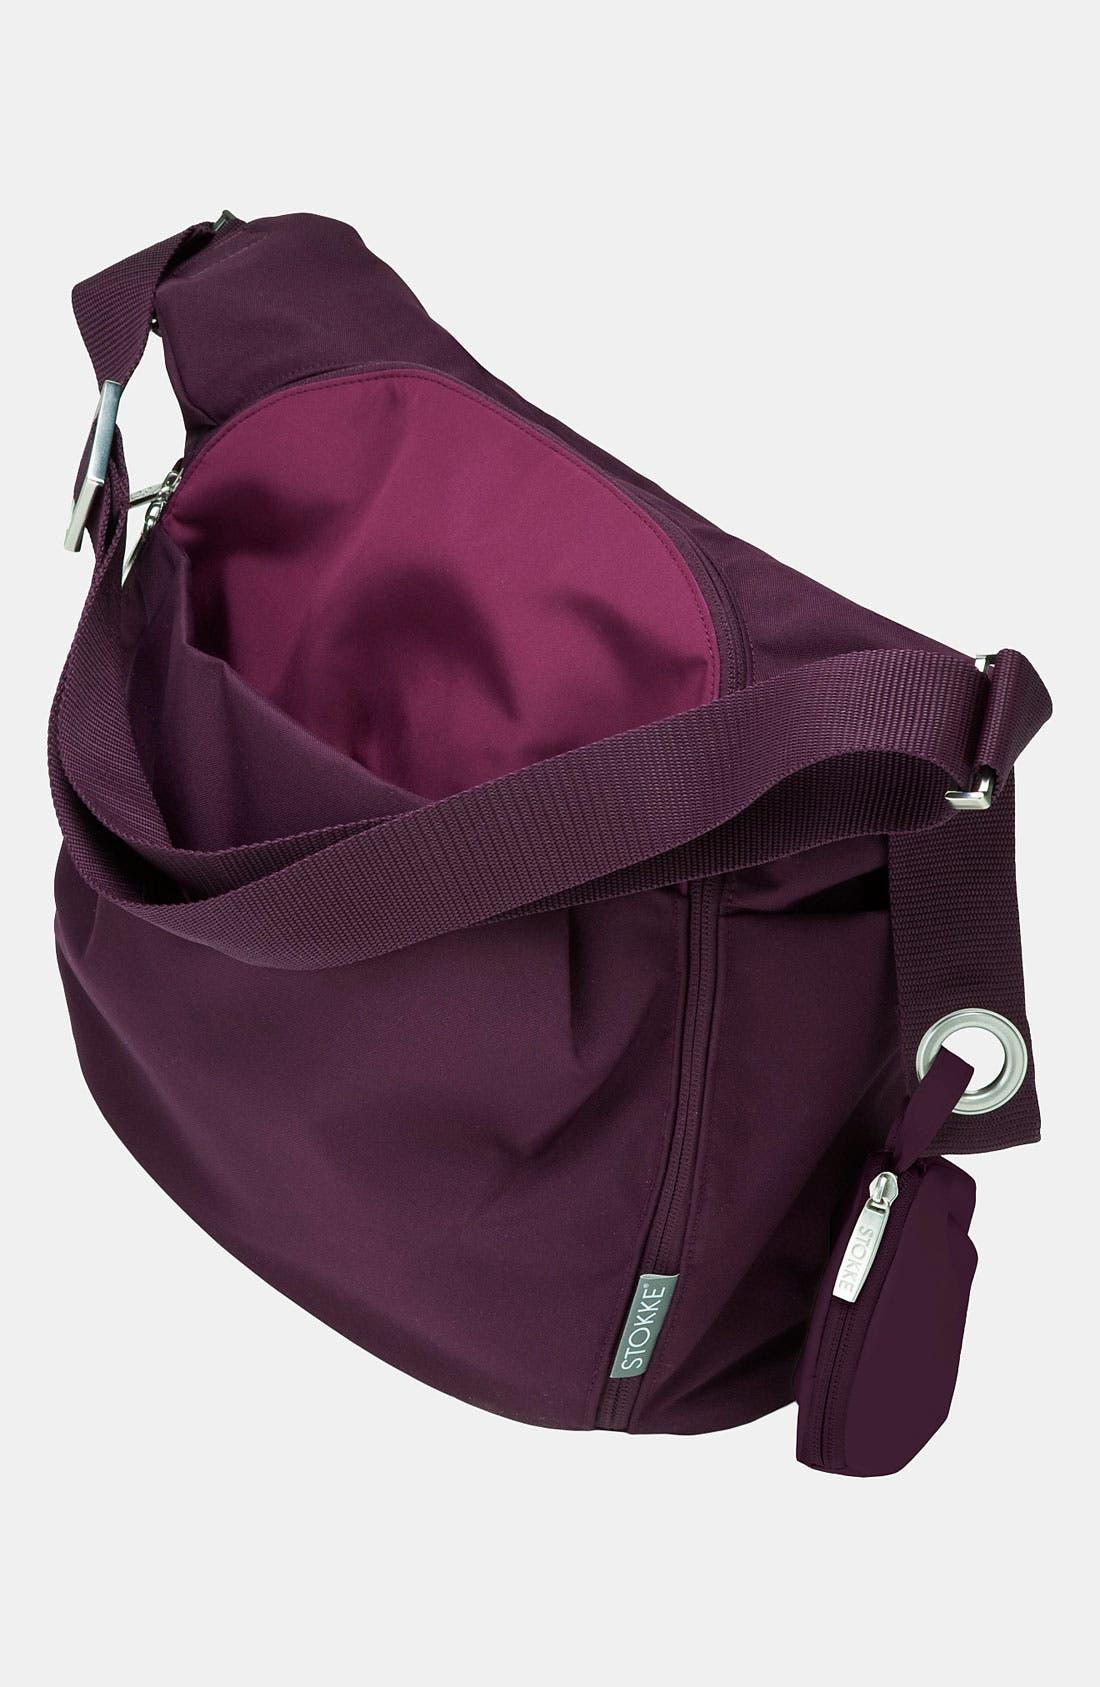 Main Image - Stokke Baby 'Xplory®' Changing Bag